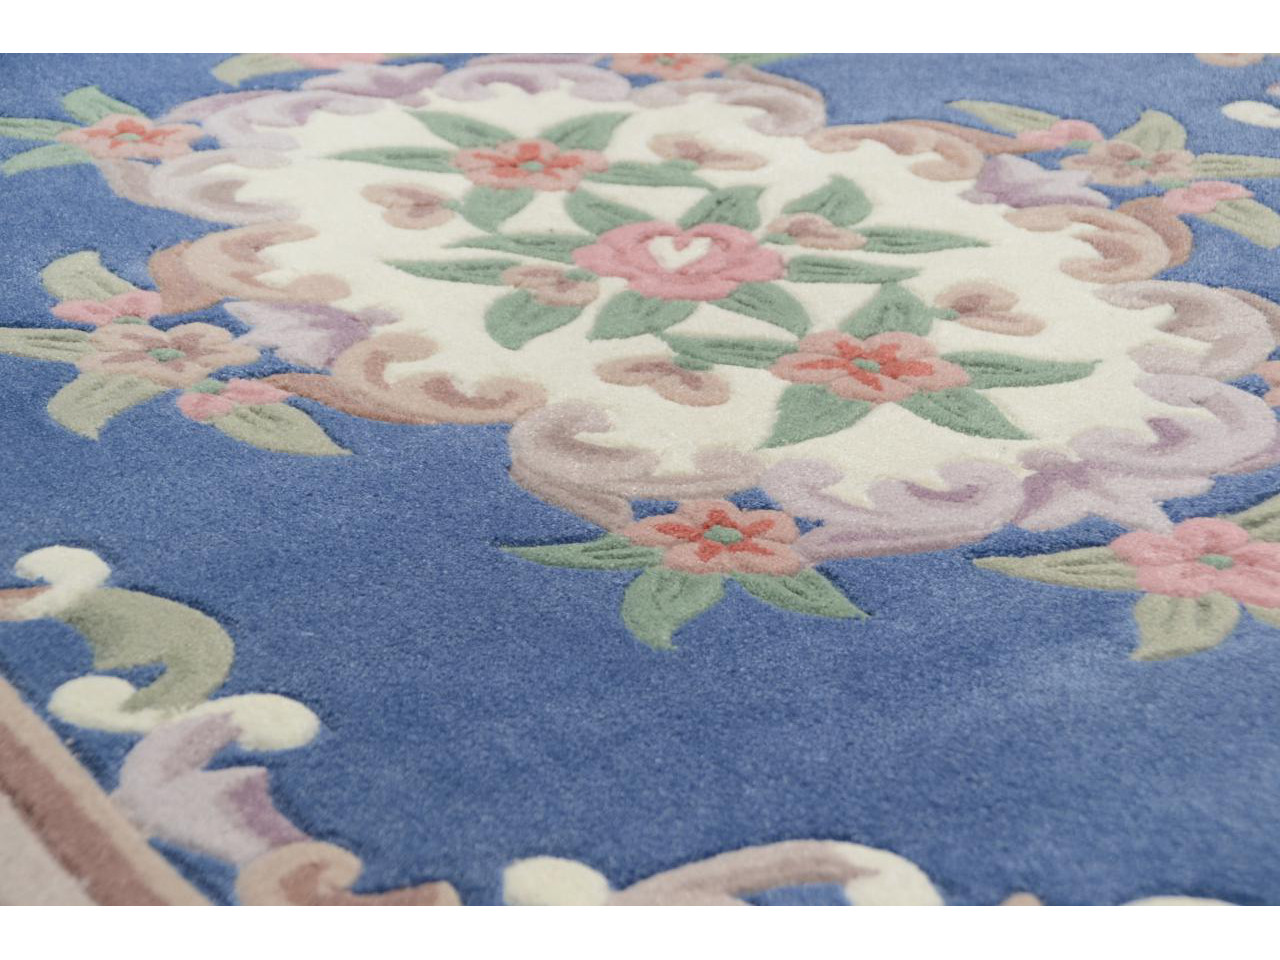 aubusson bleu tapis chinois n 32287 230x160cm. Black Bedroom Furniture Sets. Home Design Ideas